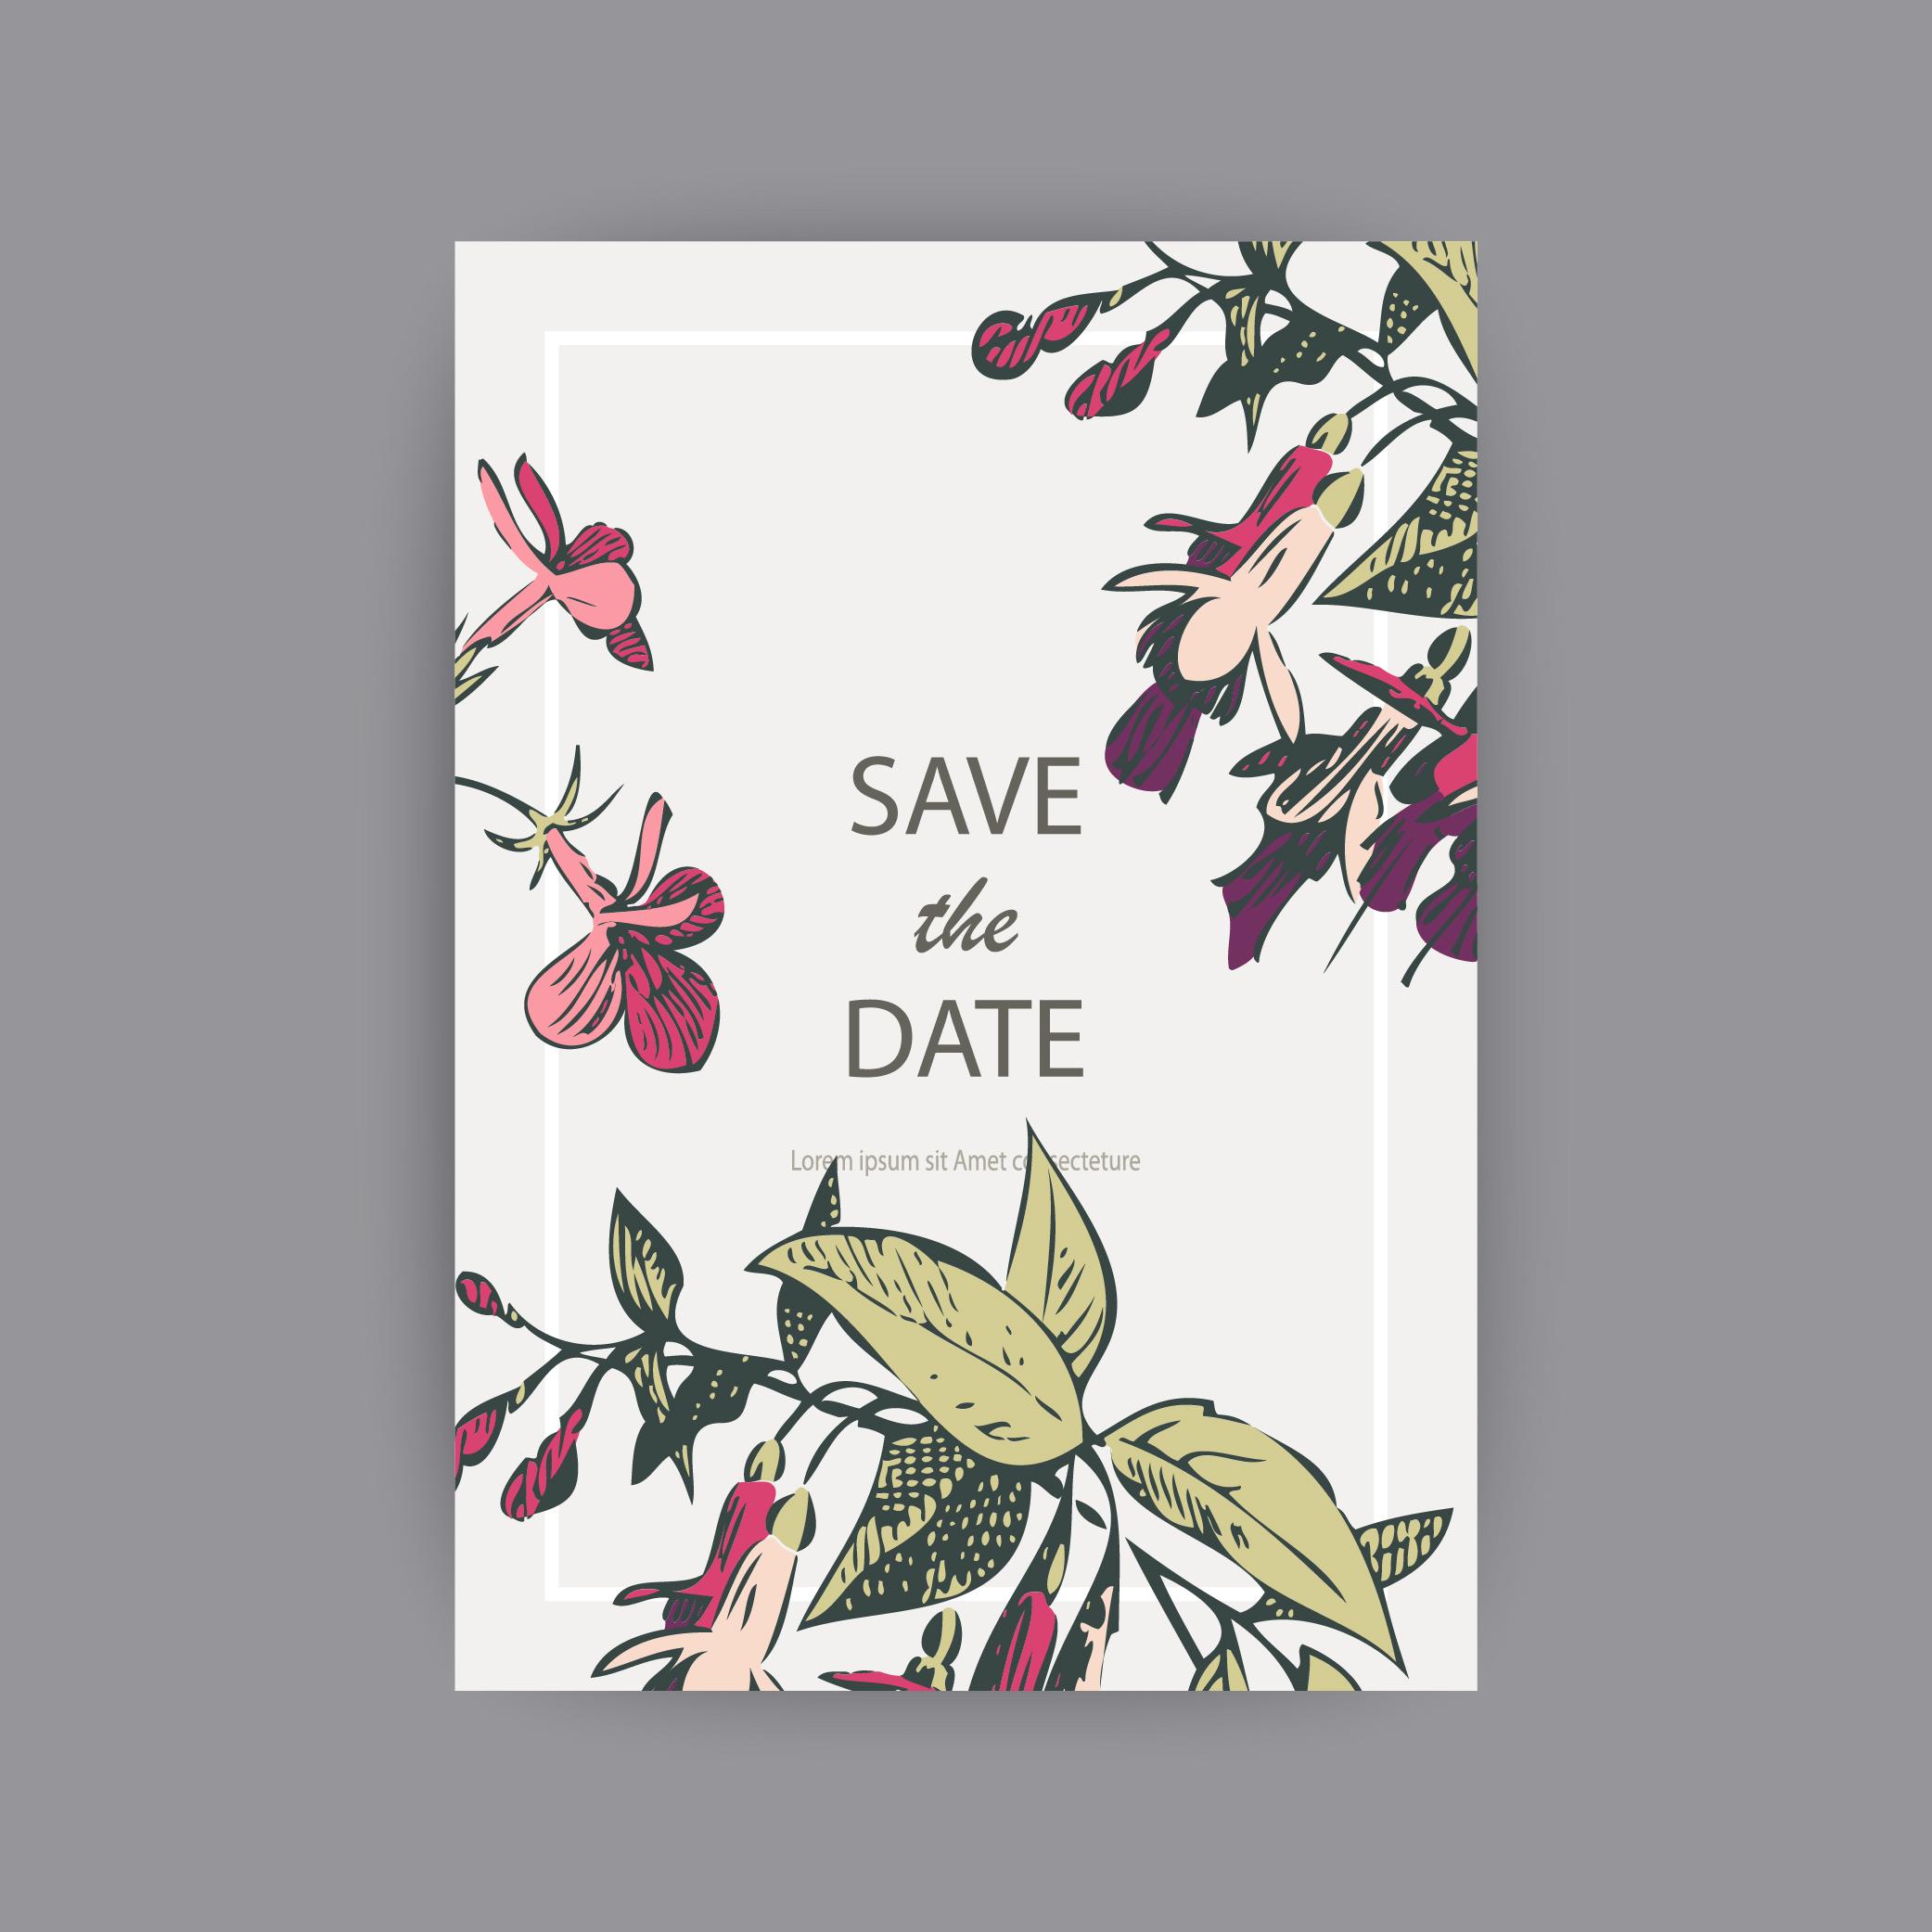 Fuchsia flower templates for card, invitation, wedding example image 4